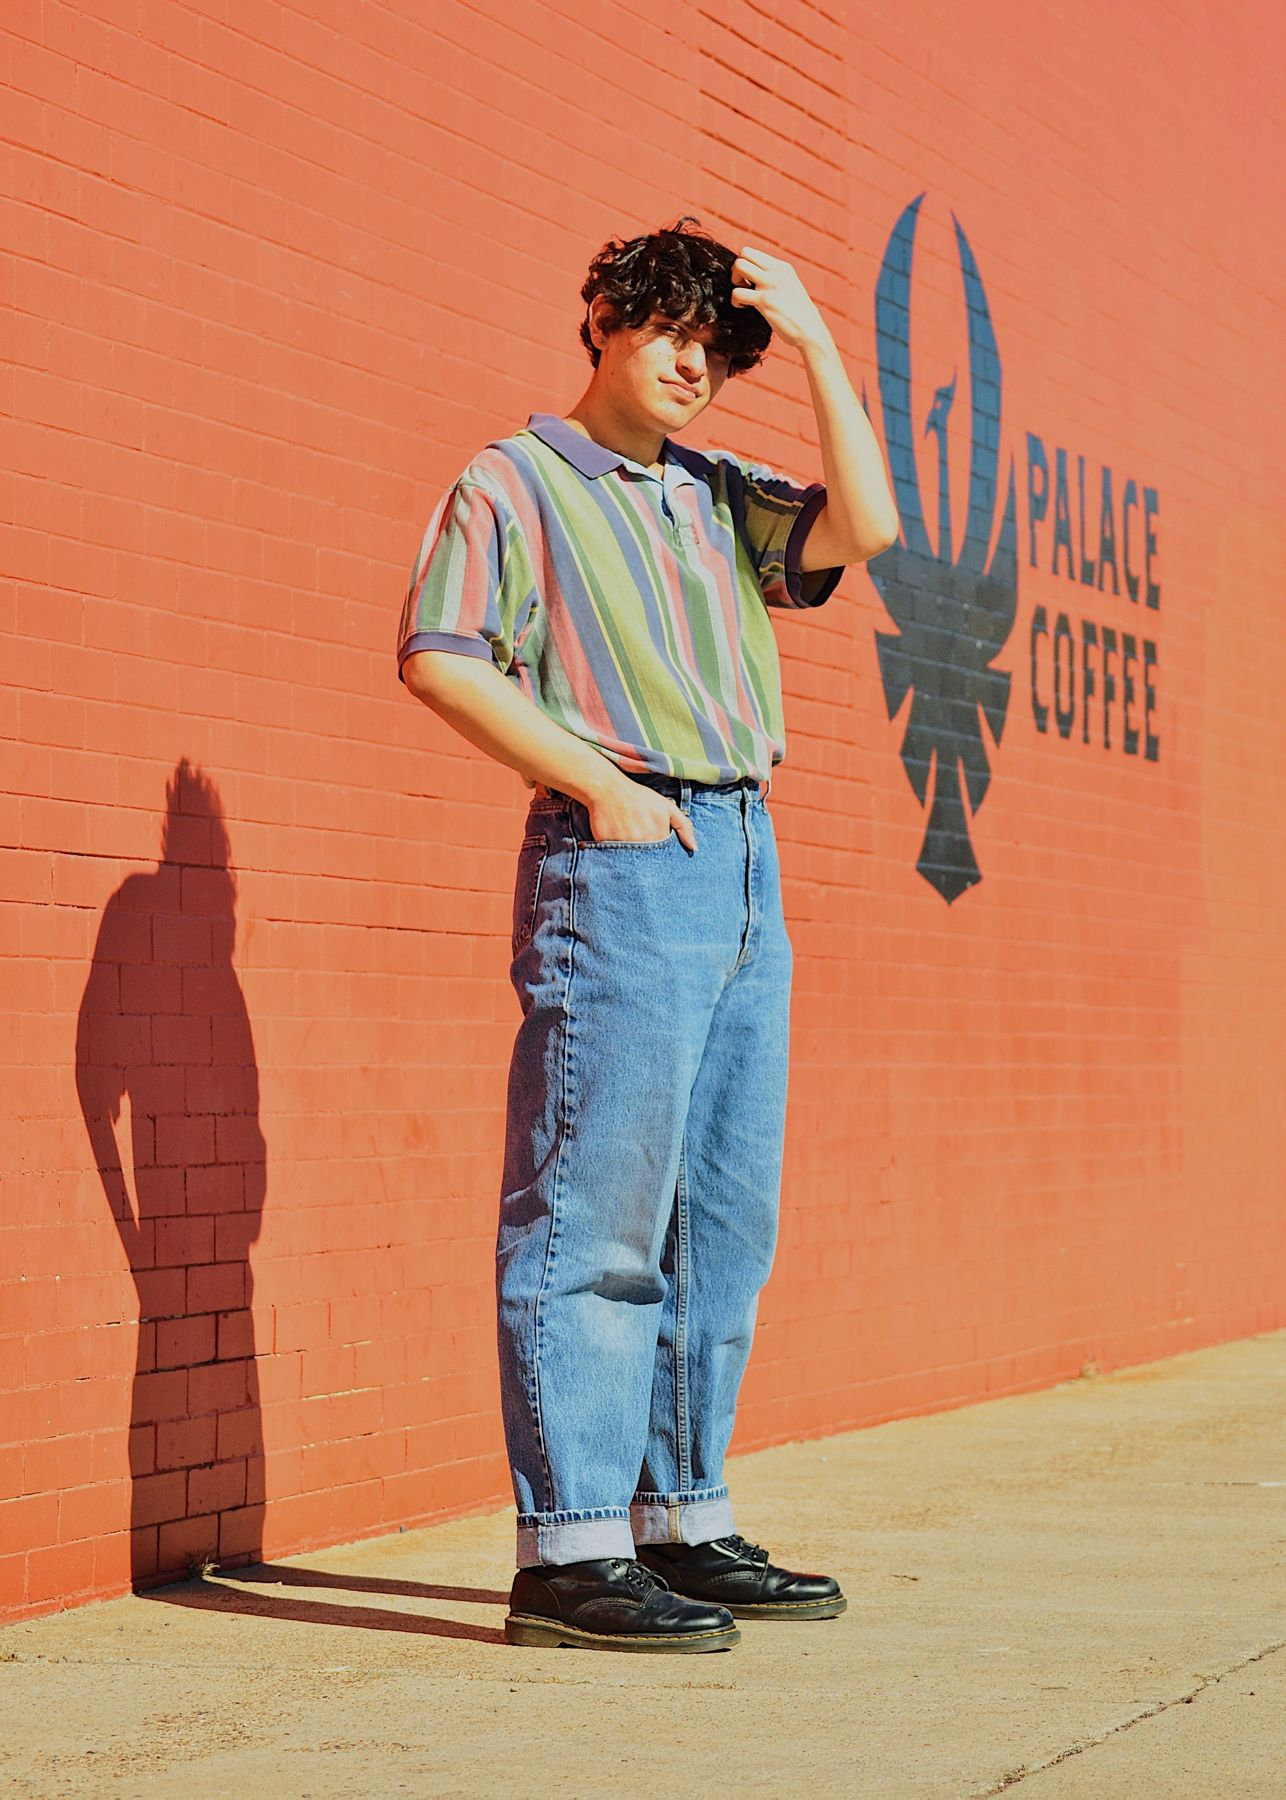 Vintage Style In 2020 90s Fashion Men 90s Outfit Men Vintage Fashion 90s